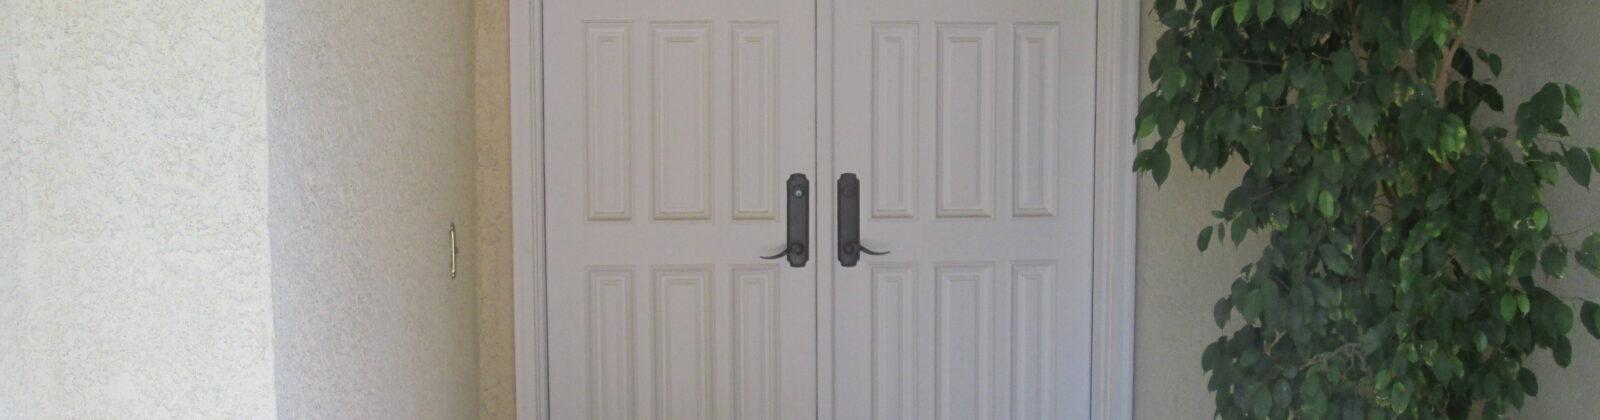 Newbury Park Door Repair Closers Replaced Amp Pet Doors